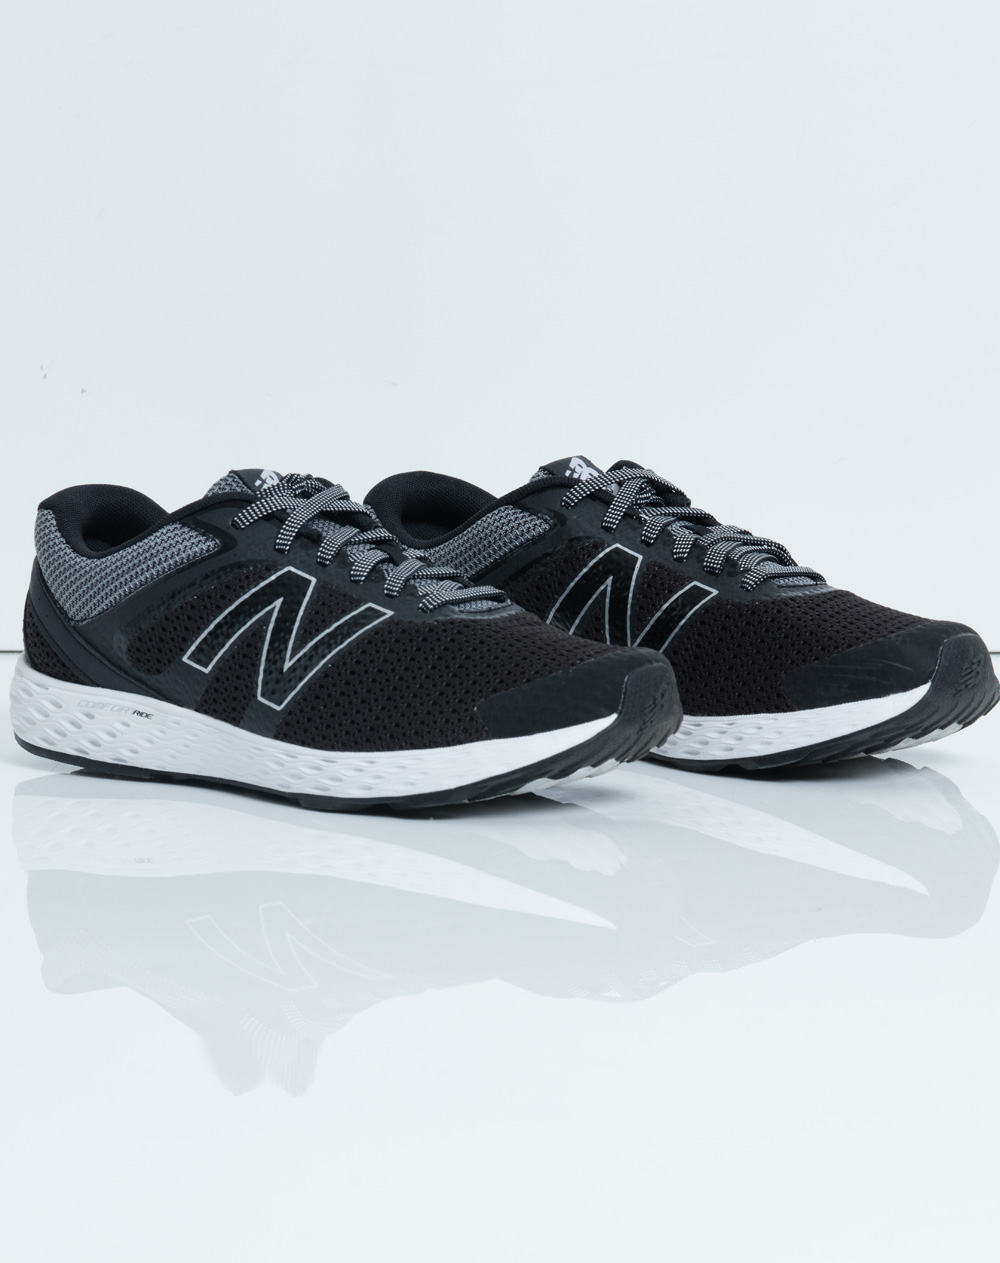 zapatos new balance hombre running negros